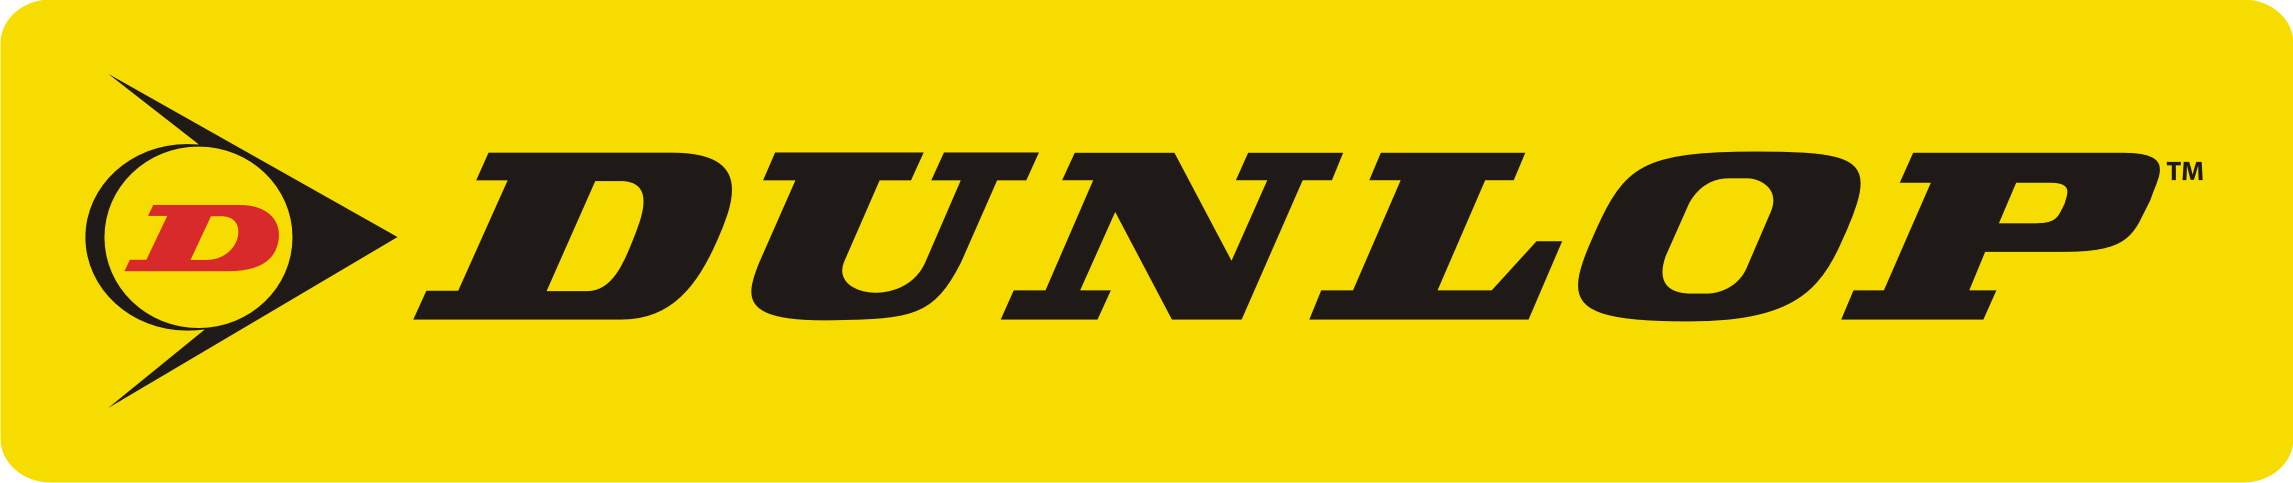 Dunlop PNG - 110426